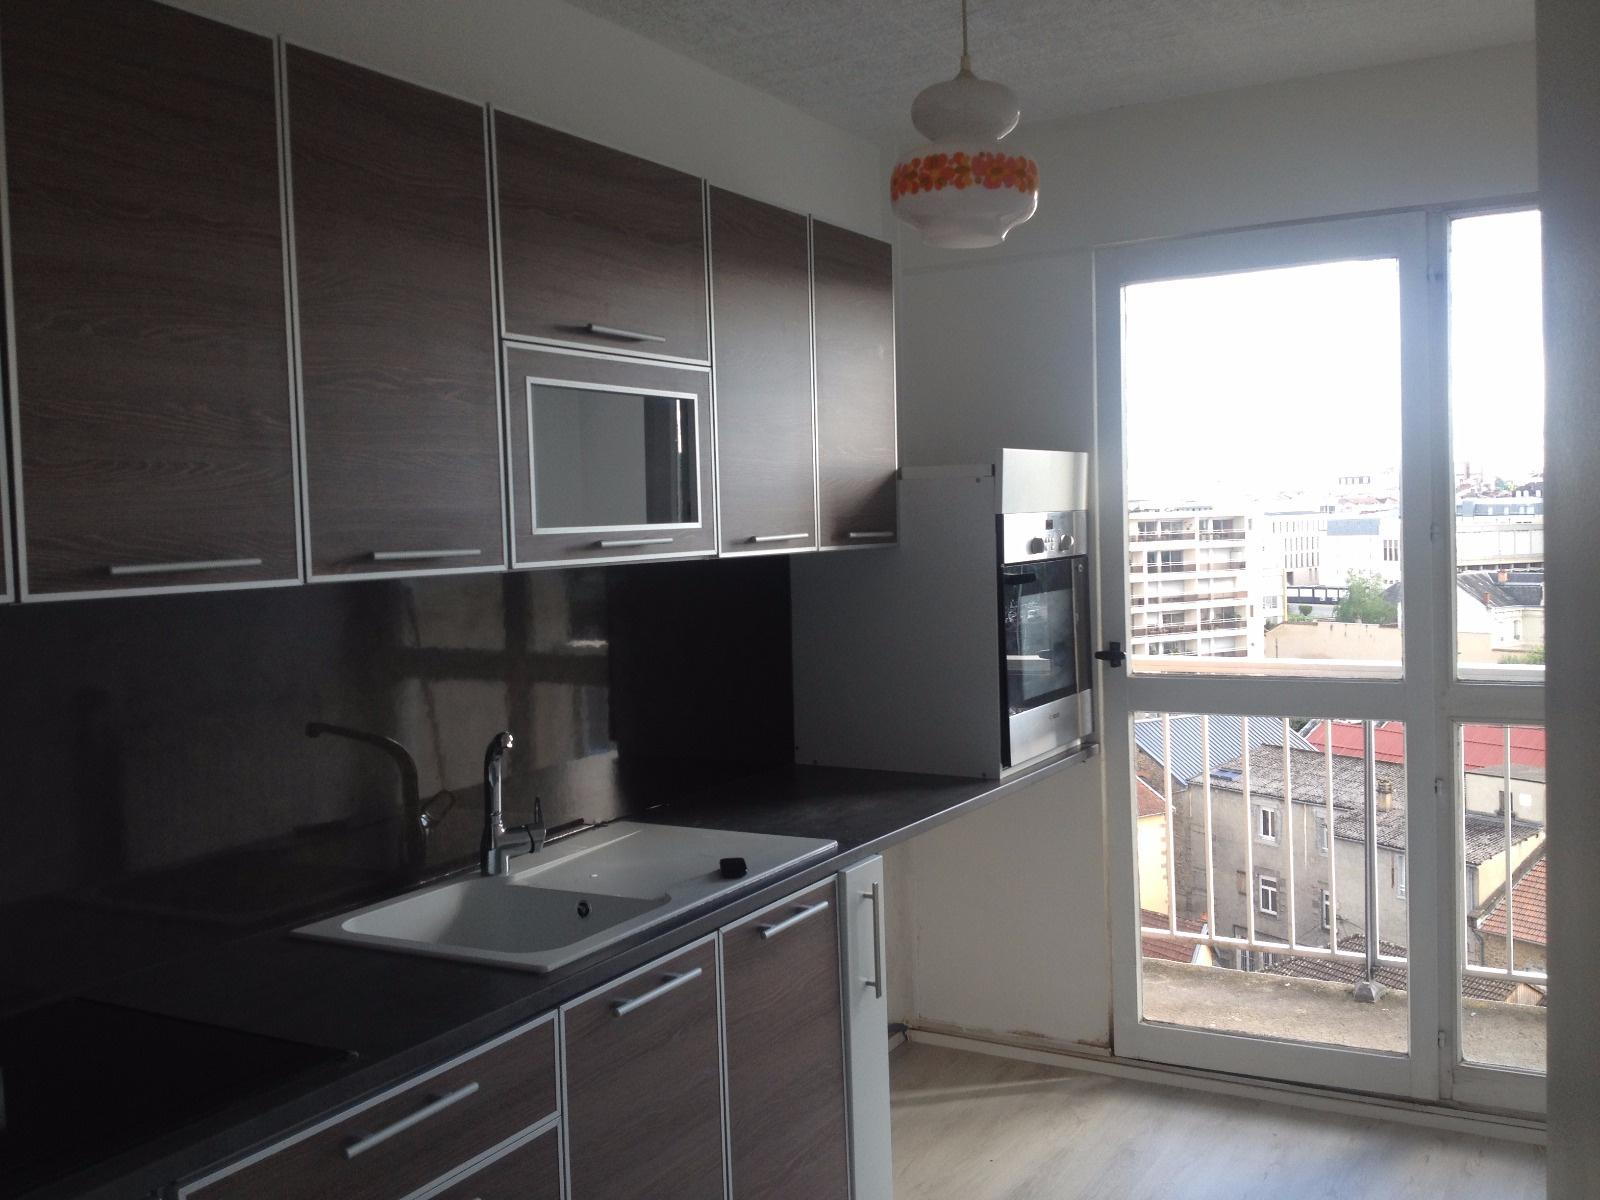 Location appartement f2 limoges 87 a l immobilier - Appartement meuble limoges ...